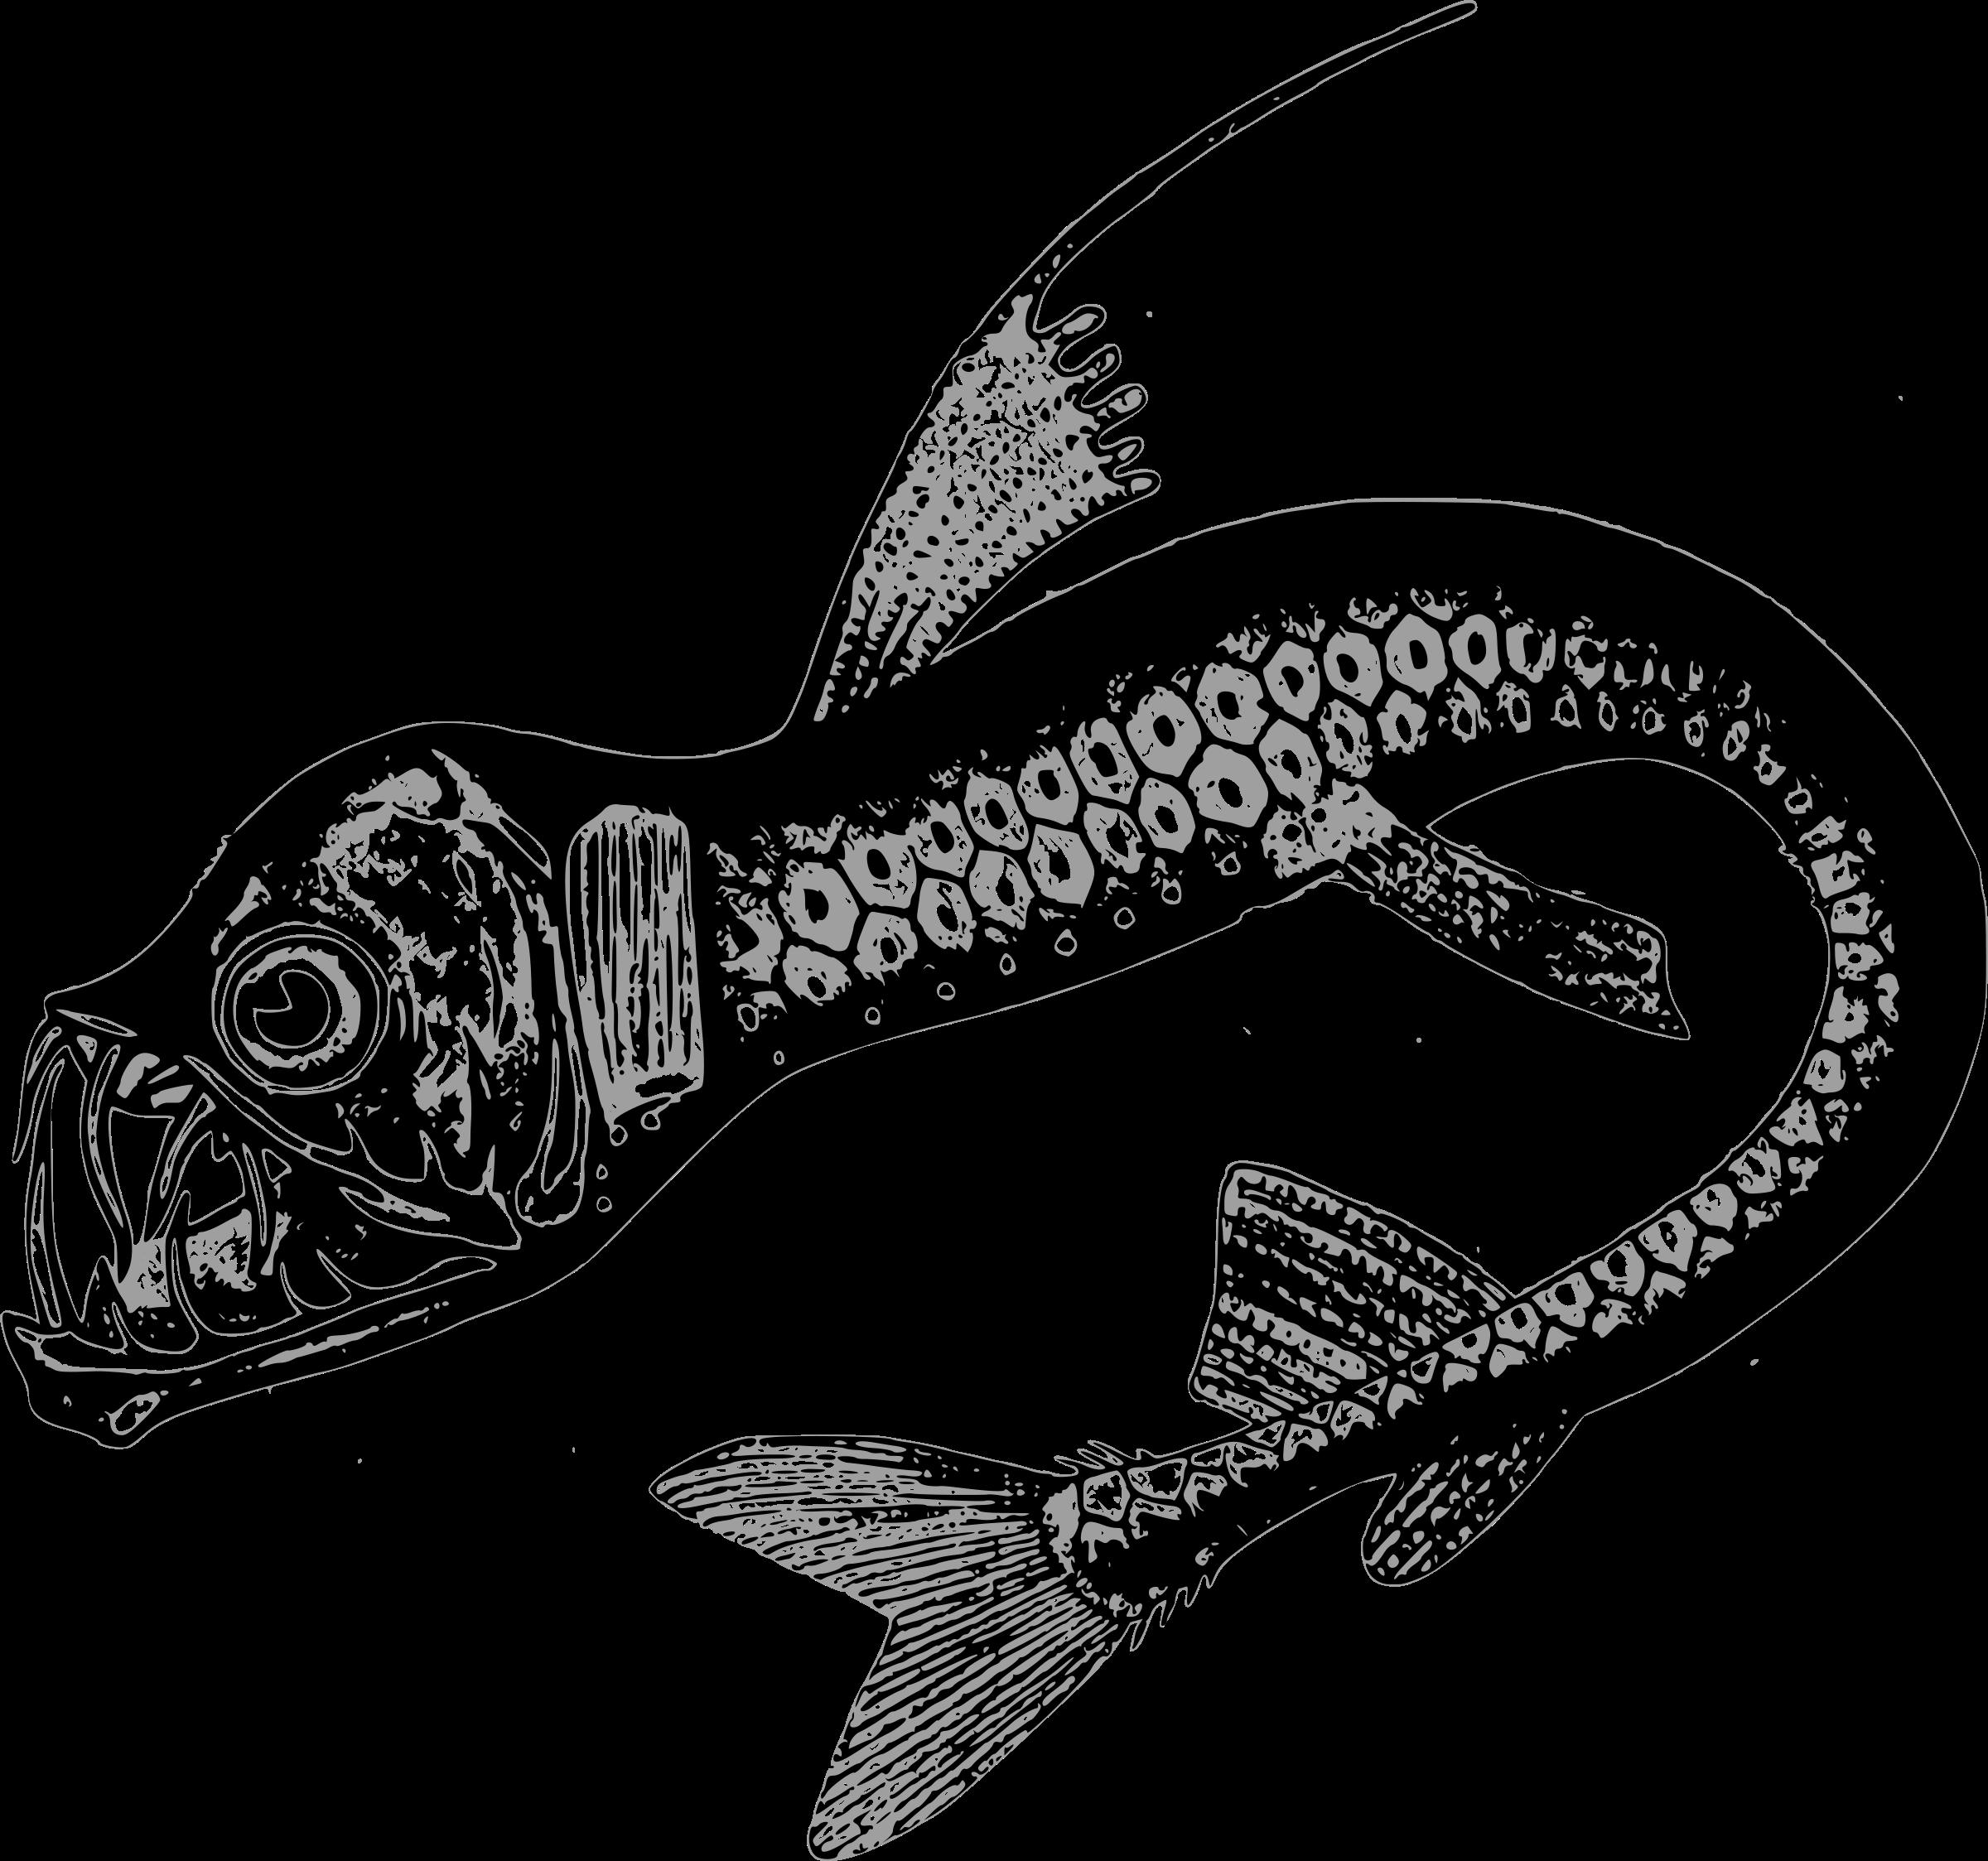 Deep Sea Clip Art - Royalty Free - GoGraph